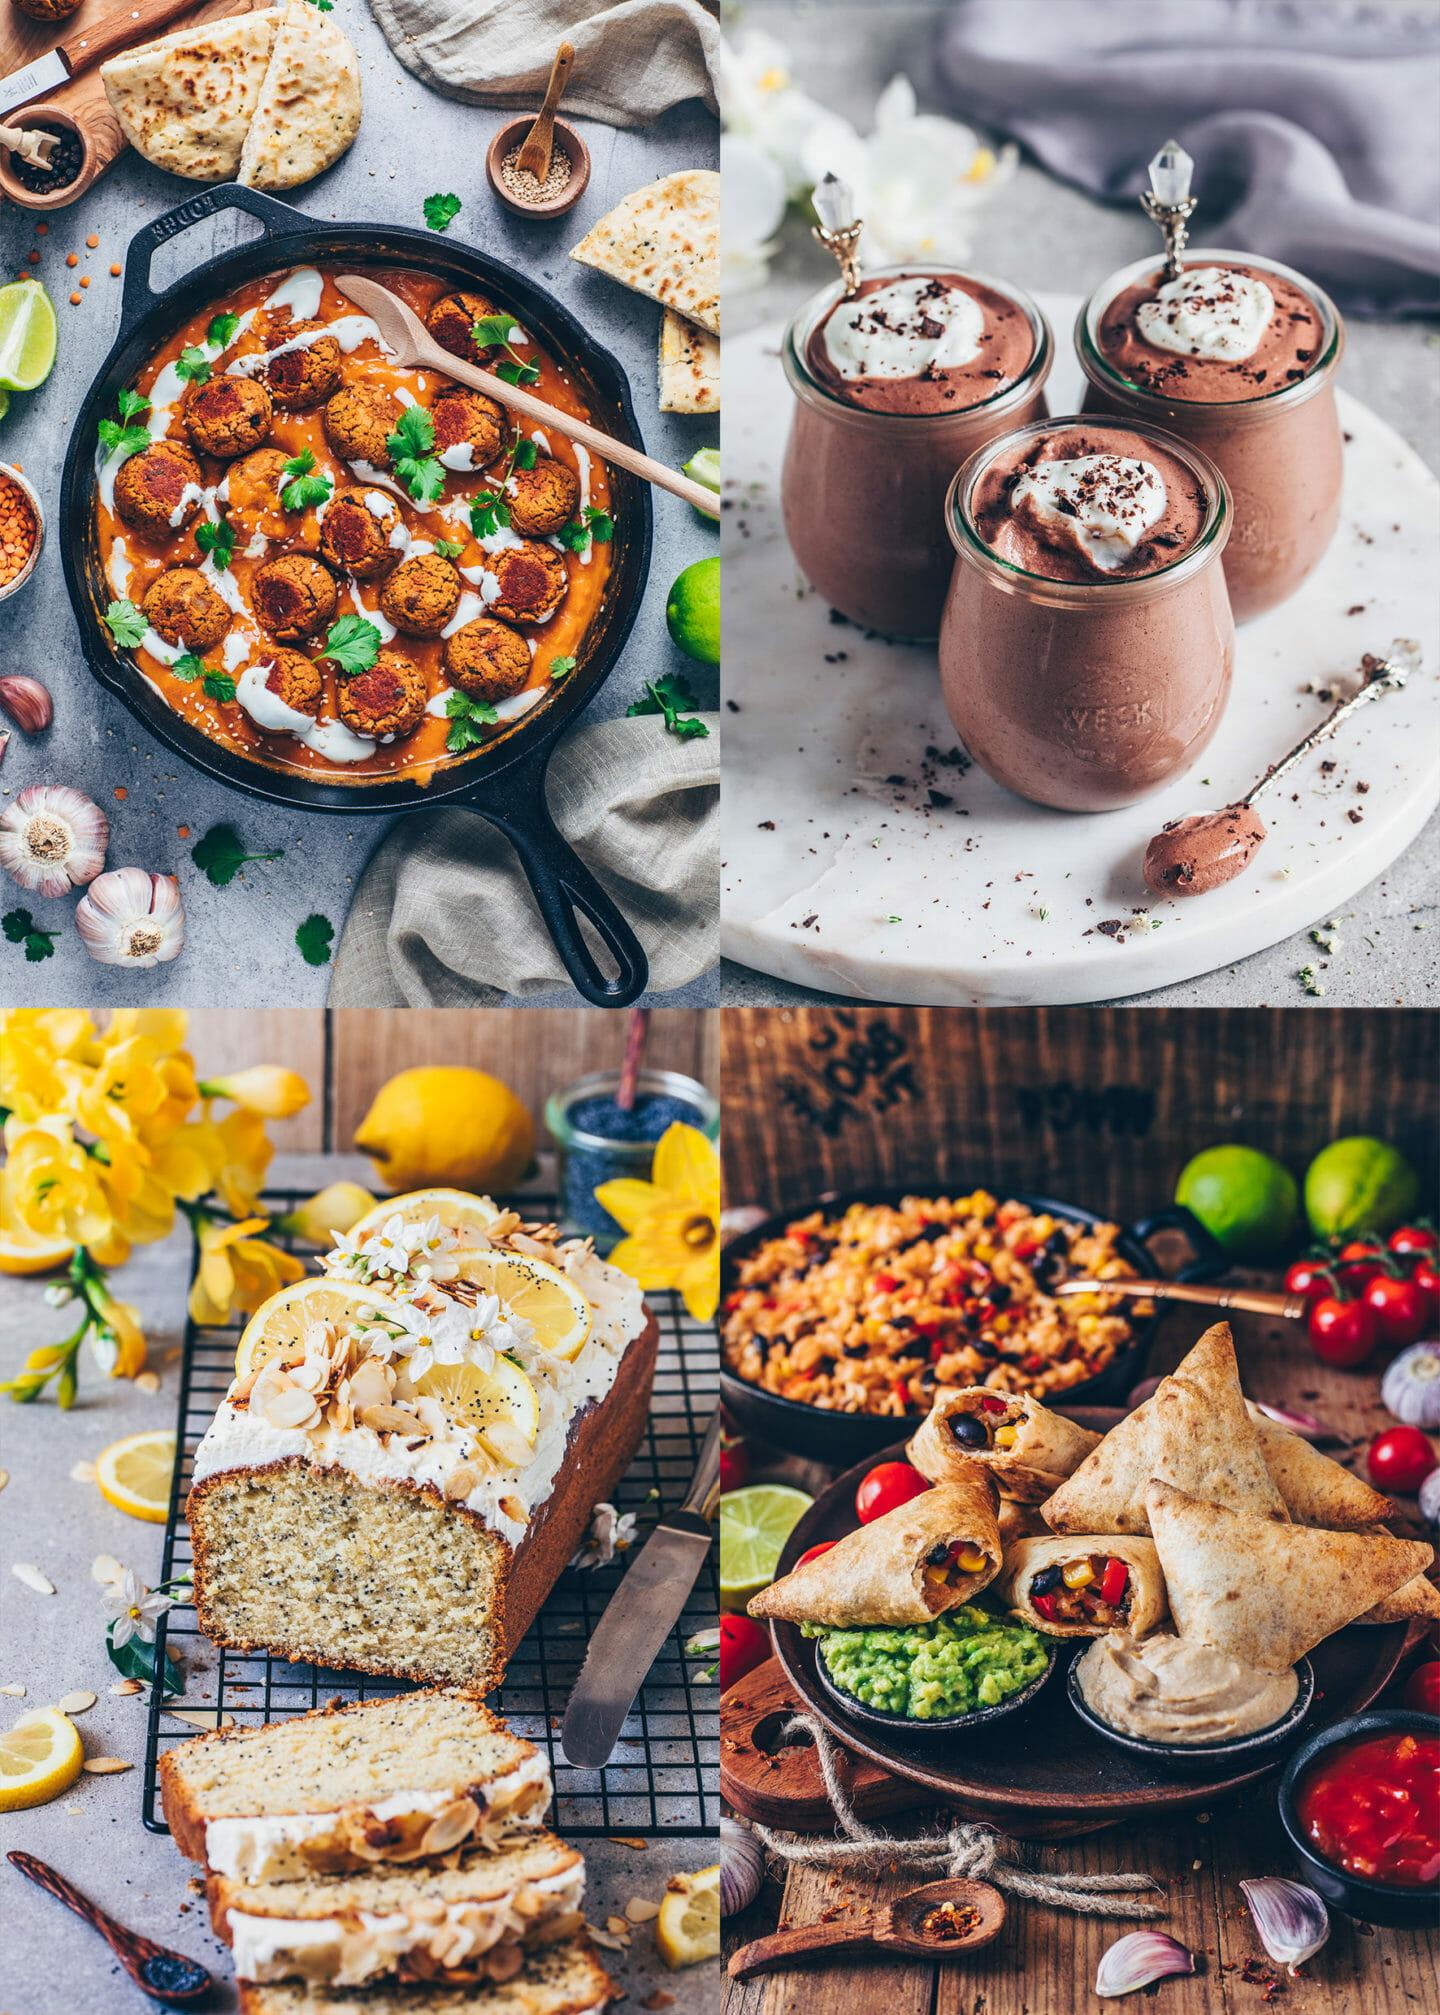 Easy Vegan Recipes (Lentil Meatballs in curry sauce, vegan chocolate mousse, poppy seed lemon cake, vegan burrito samosas)